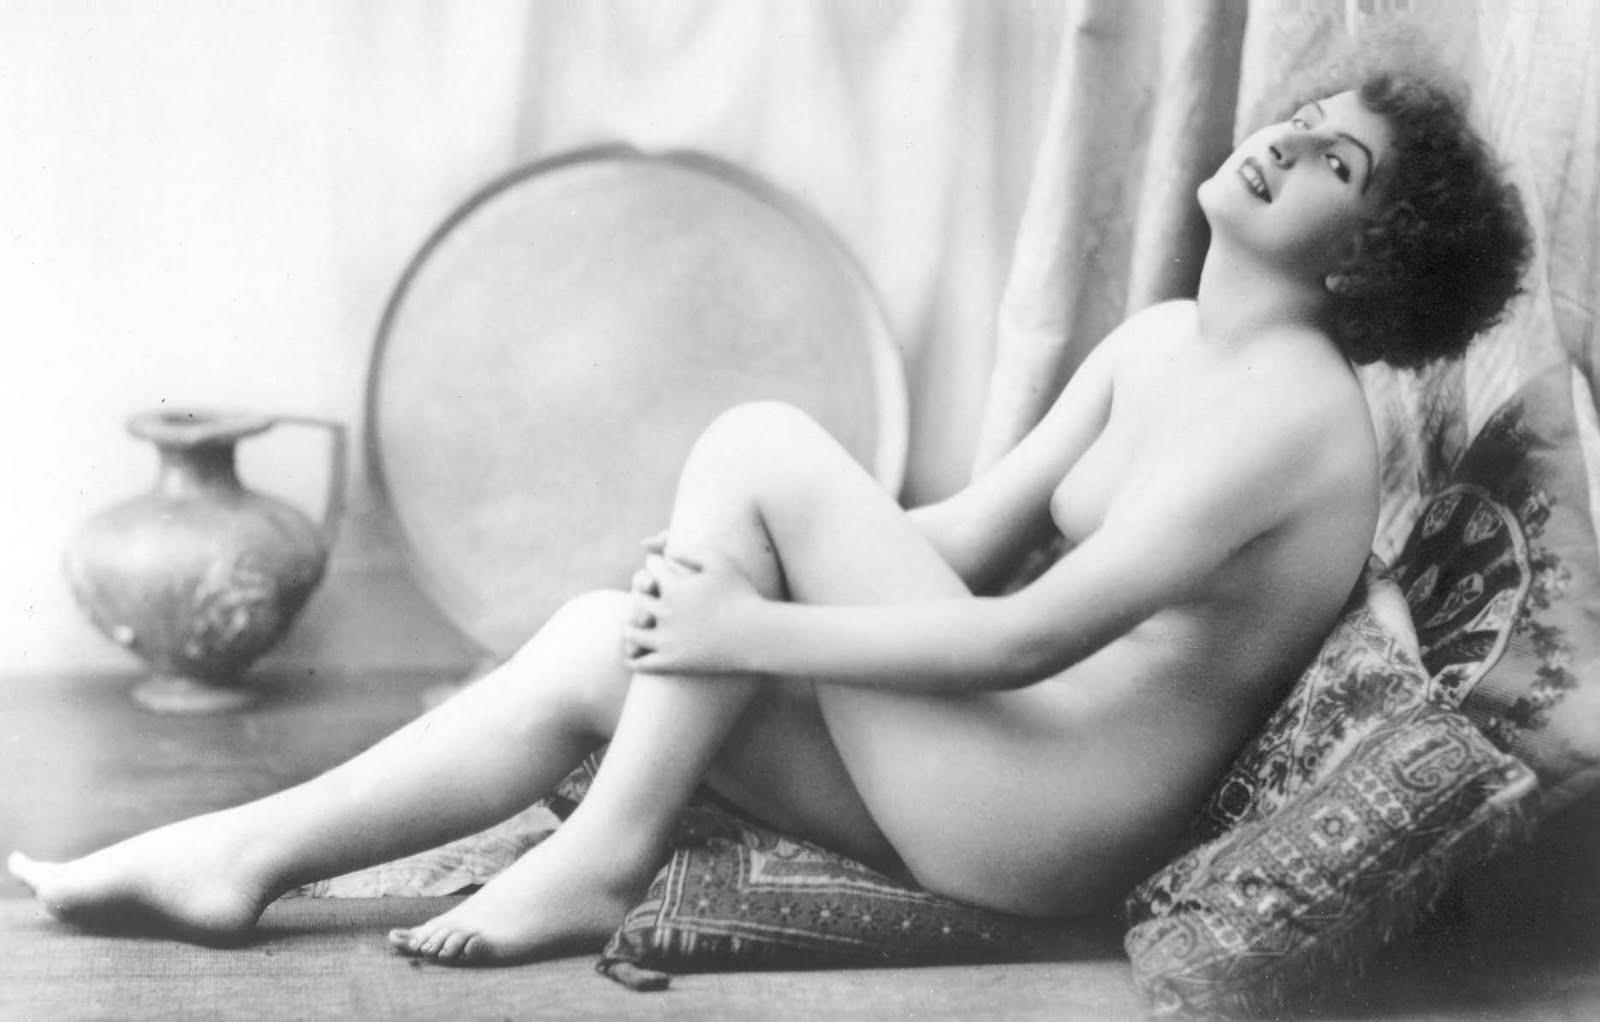 Erotica: Postcards